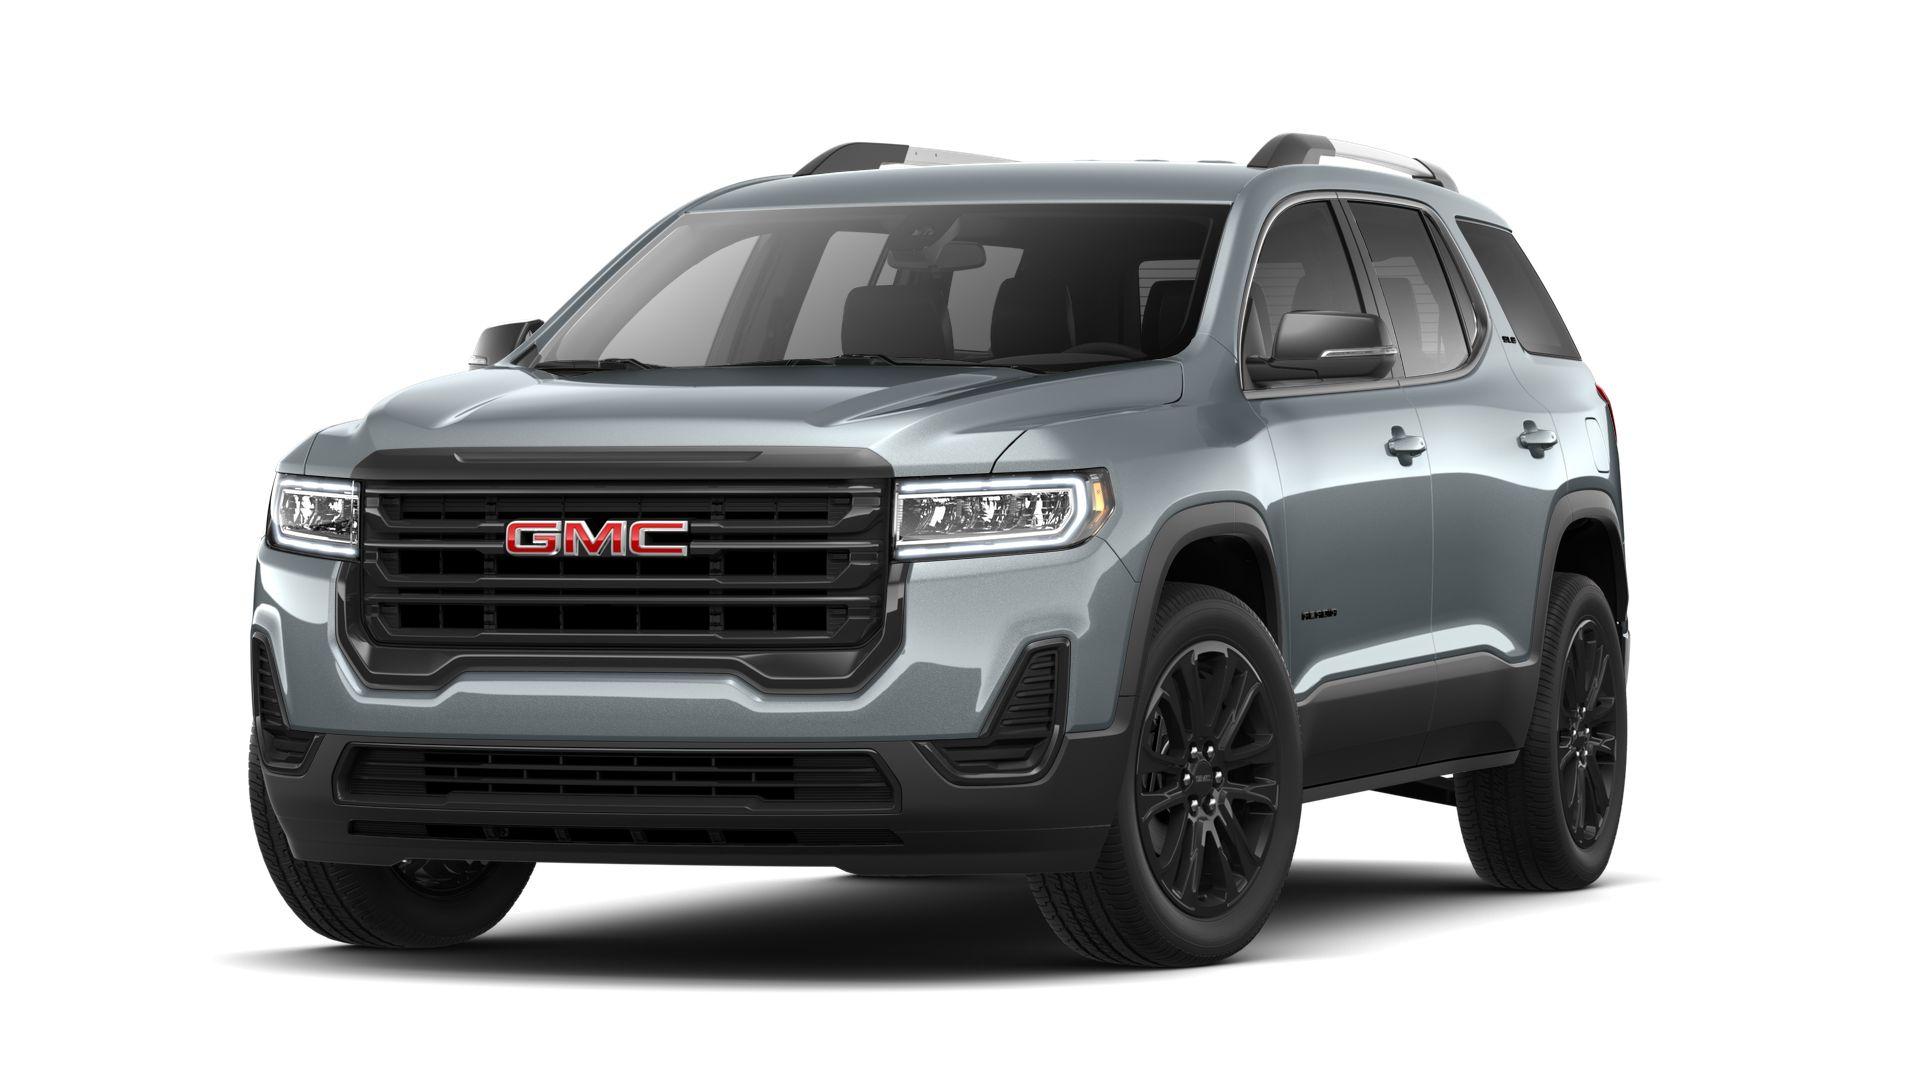 2022 GMC Acadia SUV